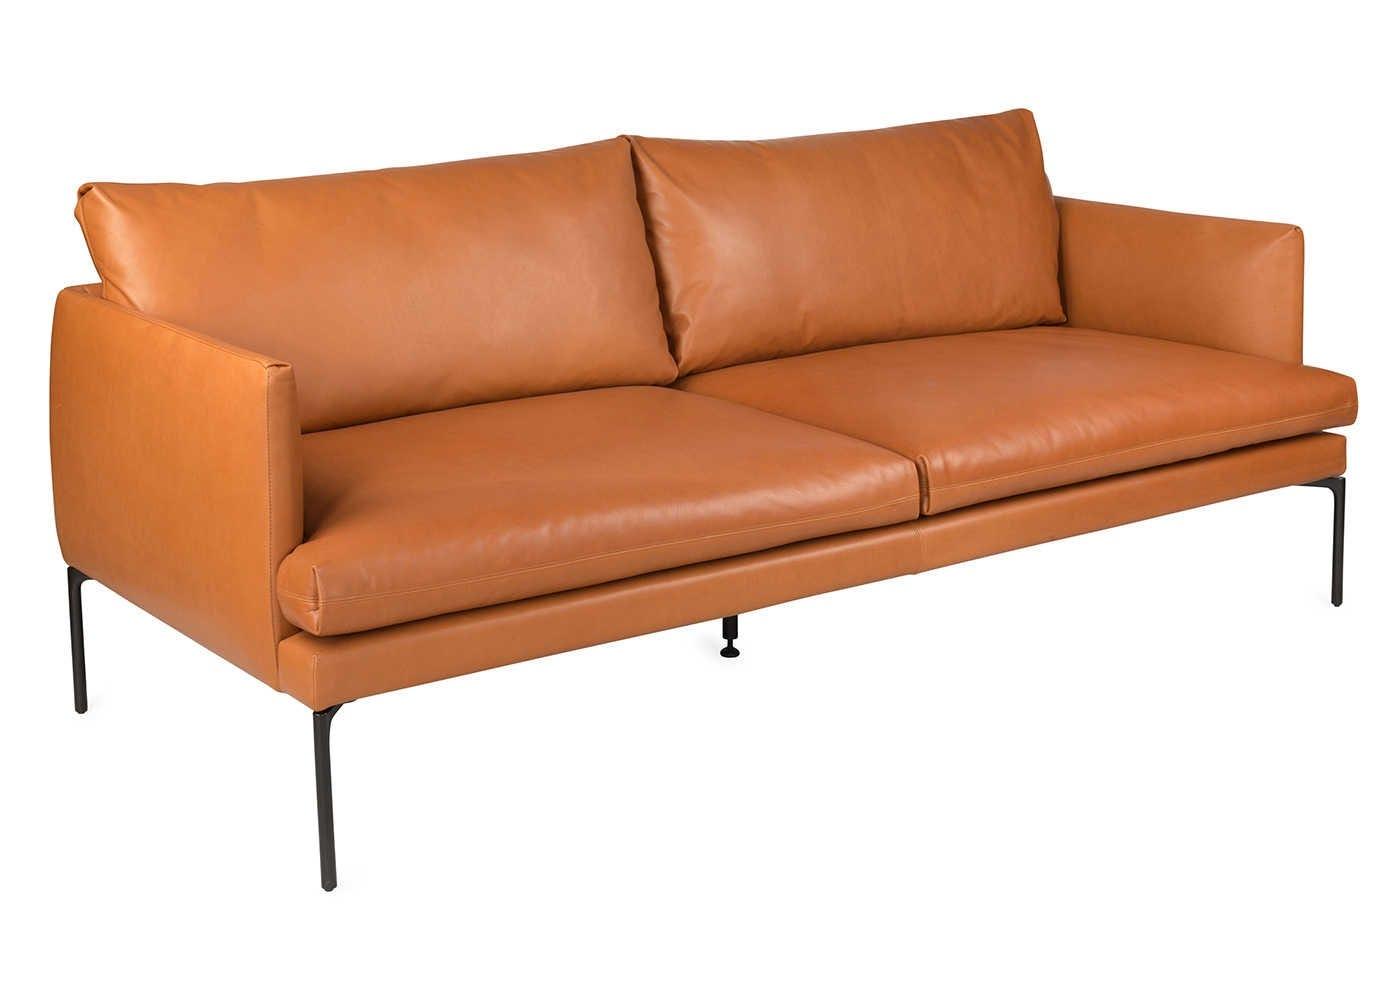 Matera 3 Seater Sofa In Daino Leather Treacle